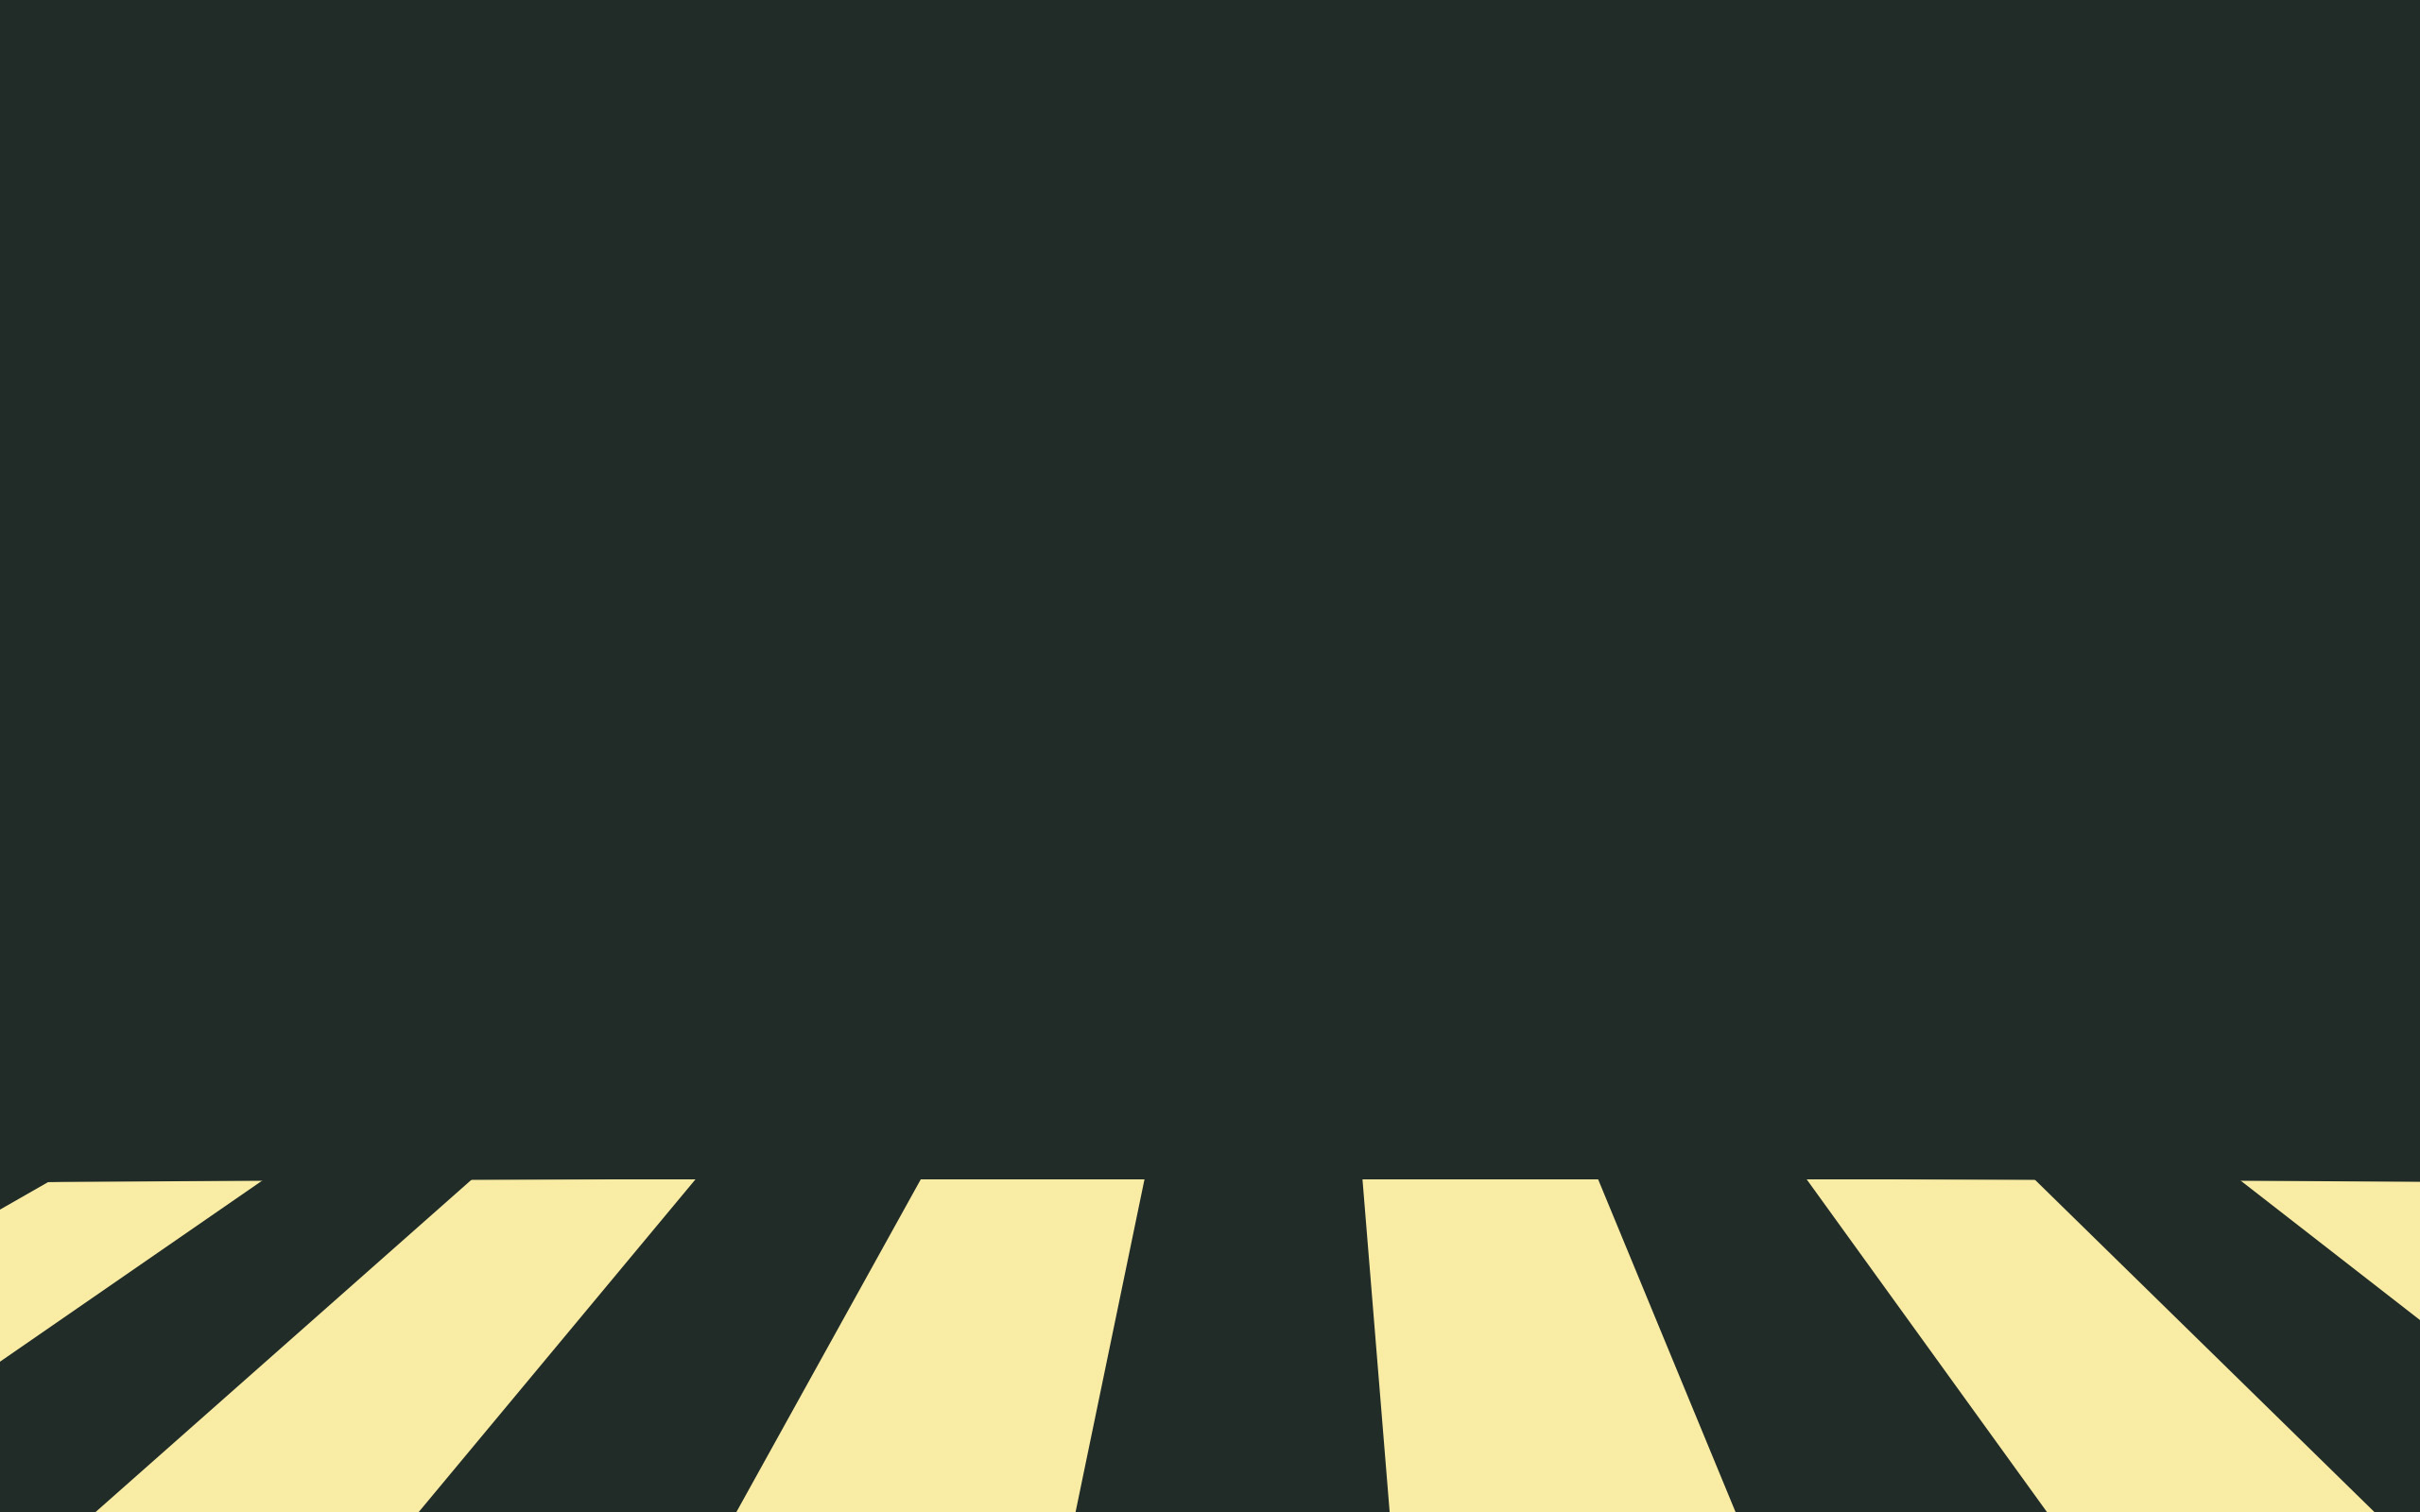 Golden tree wallpaper desktop wallpaper - Simple And Minimalist Free Desktop Wallpapers For Hd